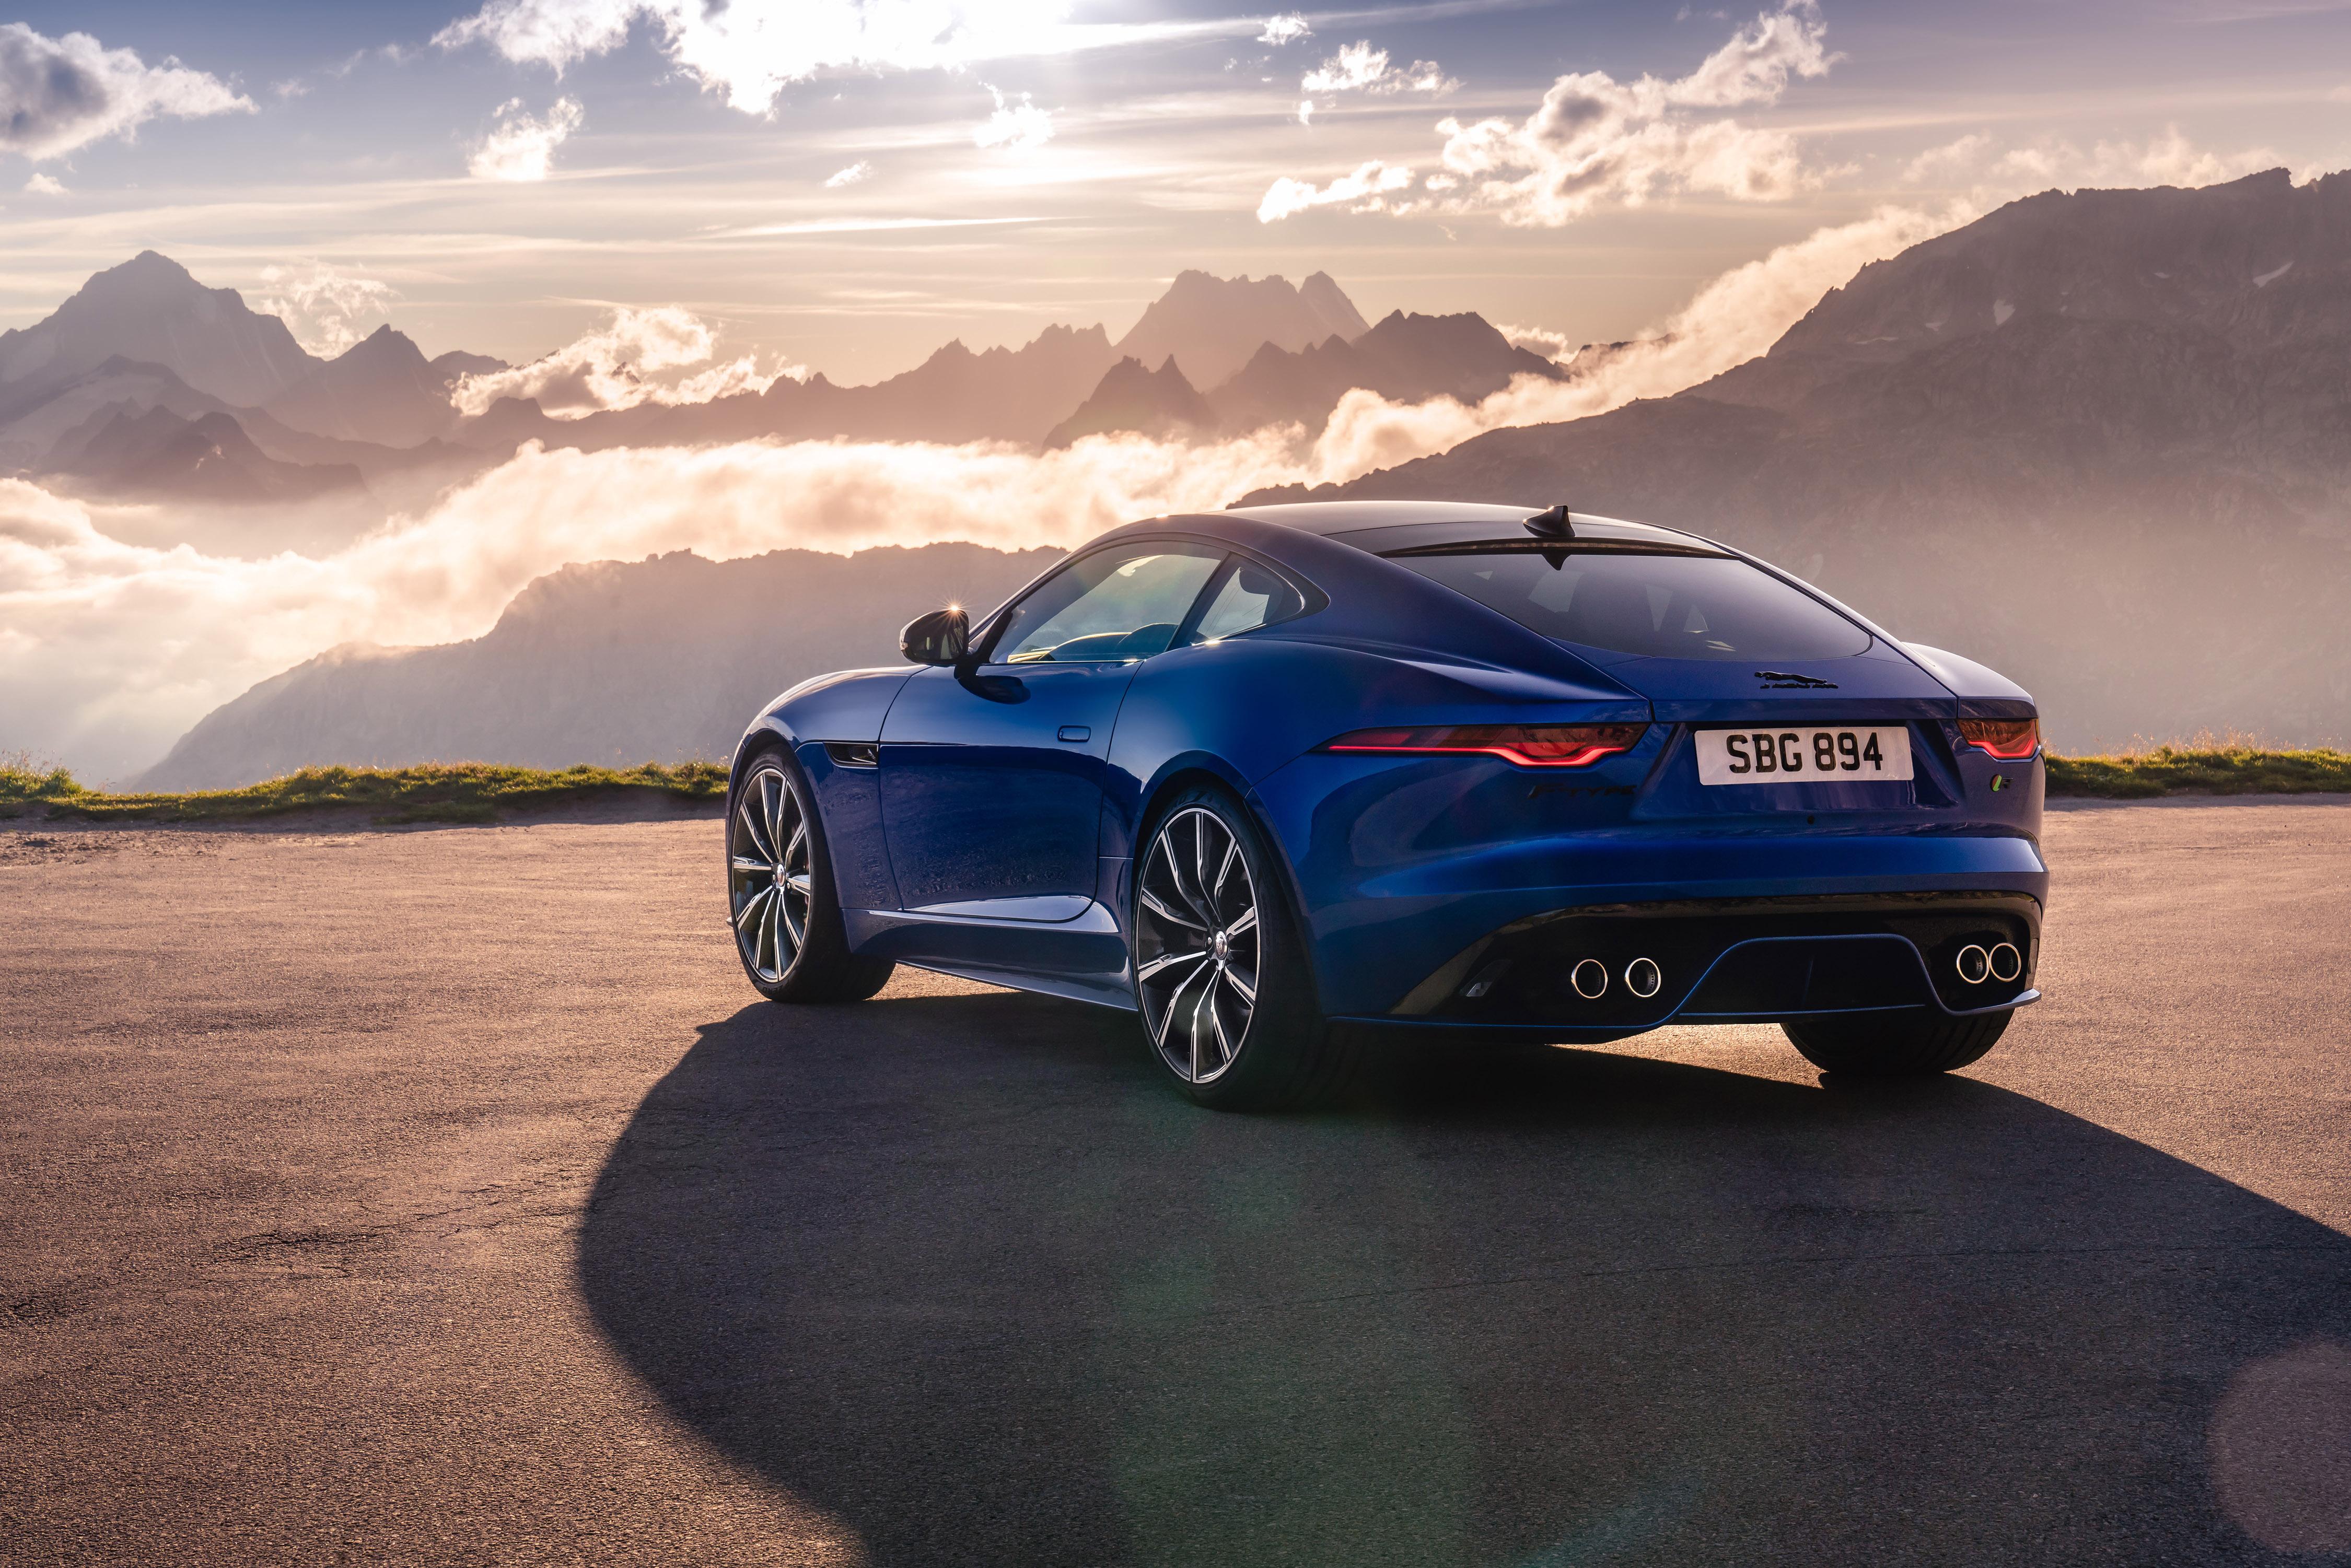 339252 10 jag f type r 21my velocity blue reveal switzerland 021219 02 d6baf8 original 1574864956